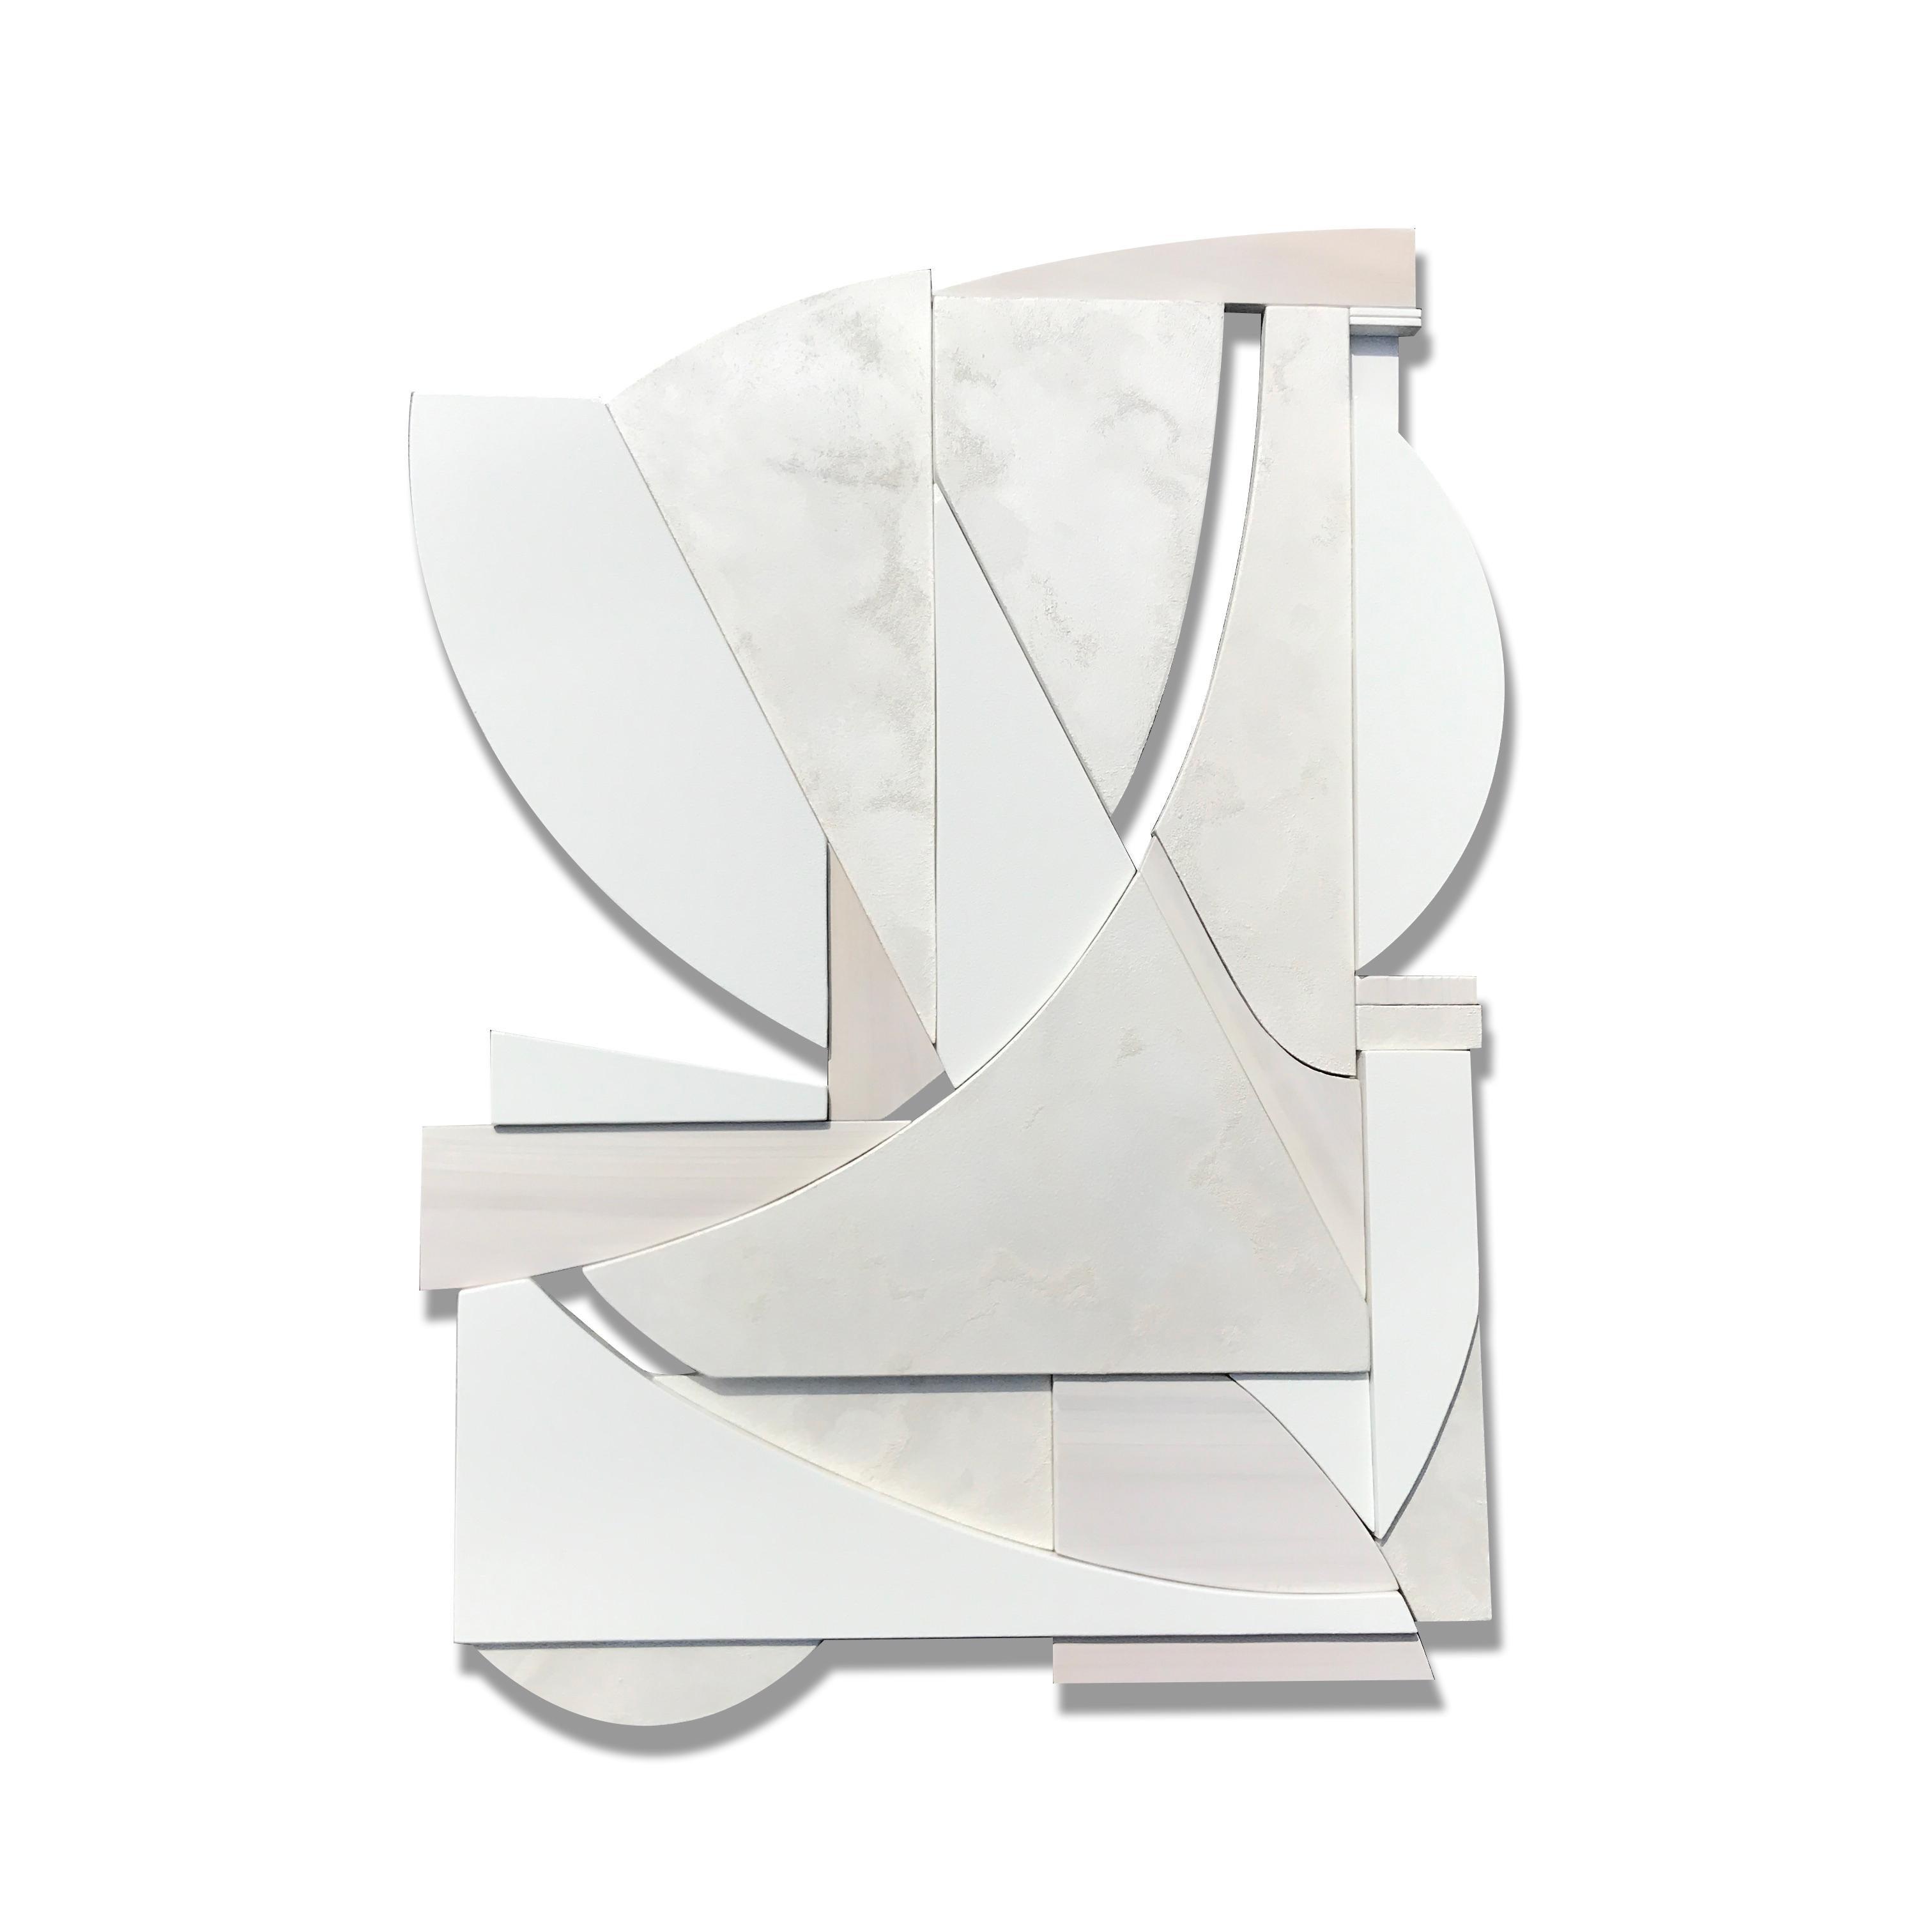 Blanco (modern art deco abstract wall sculpture geometric white monochrome cubic